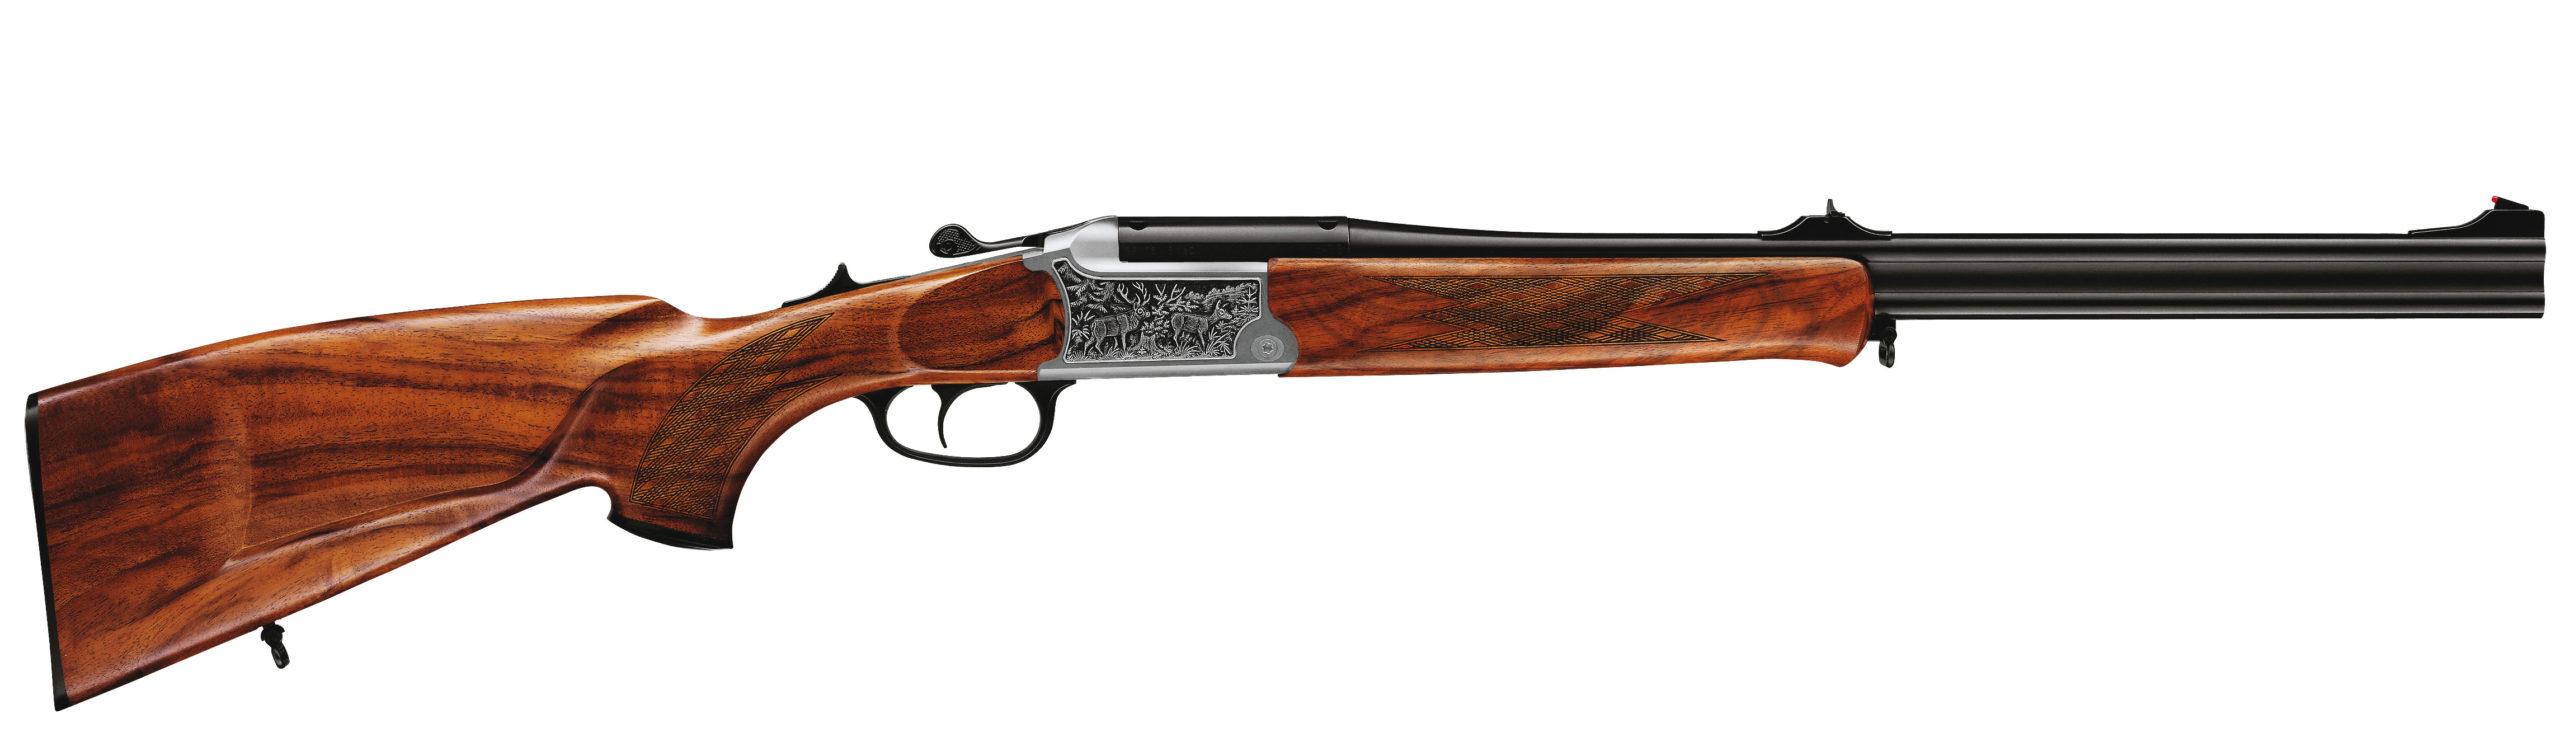 Blaser, la carabine express 2000